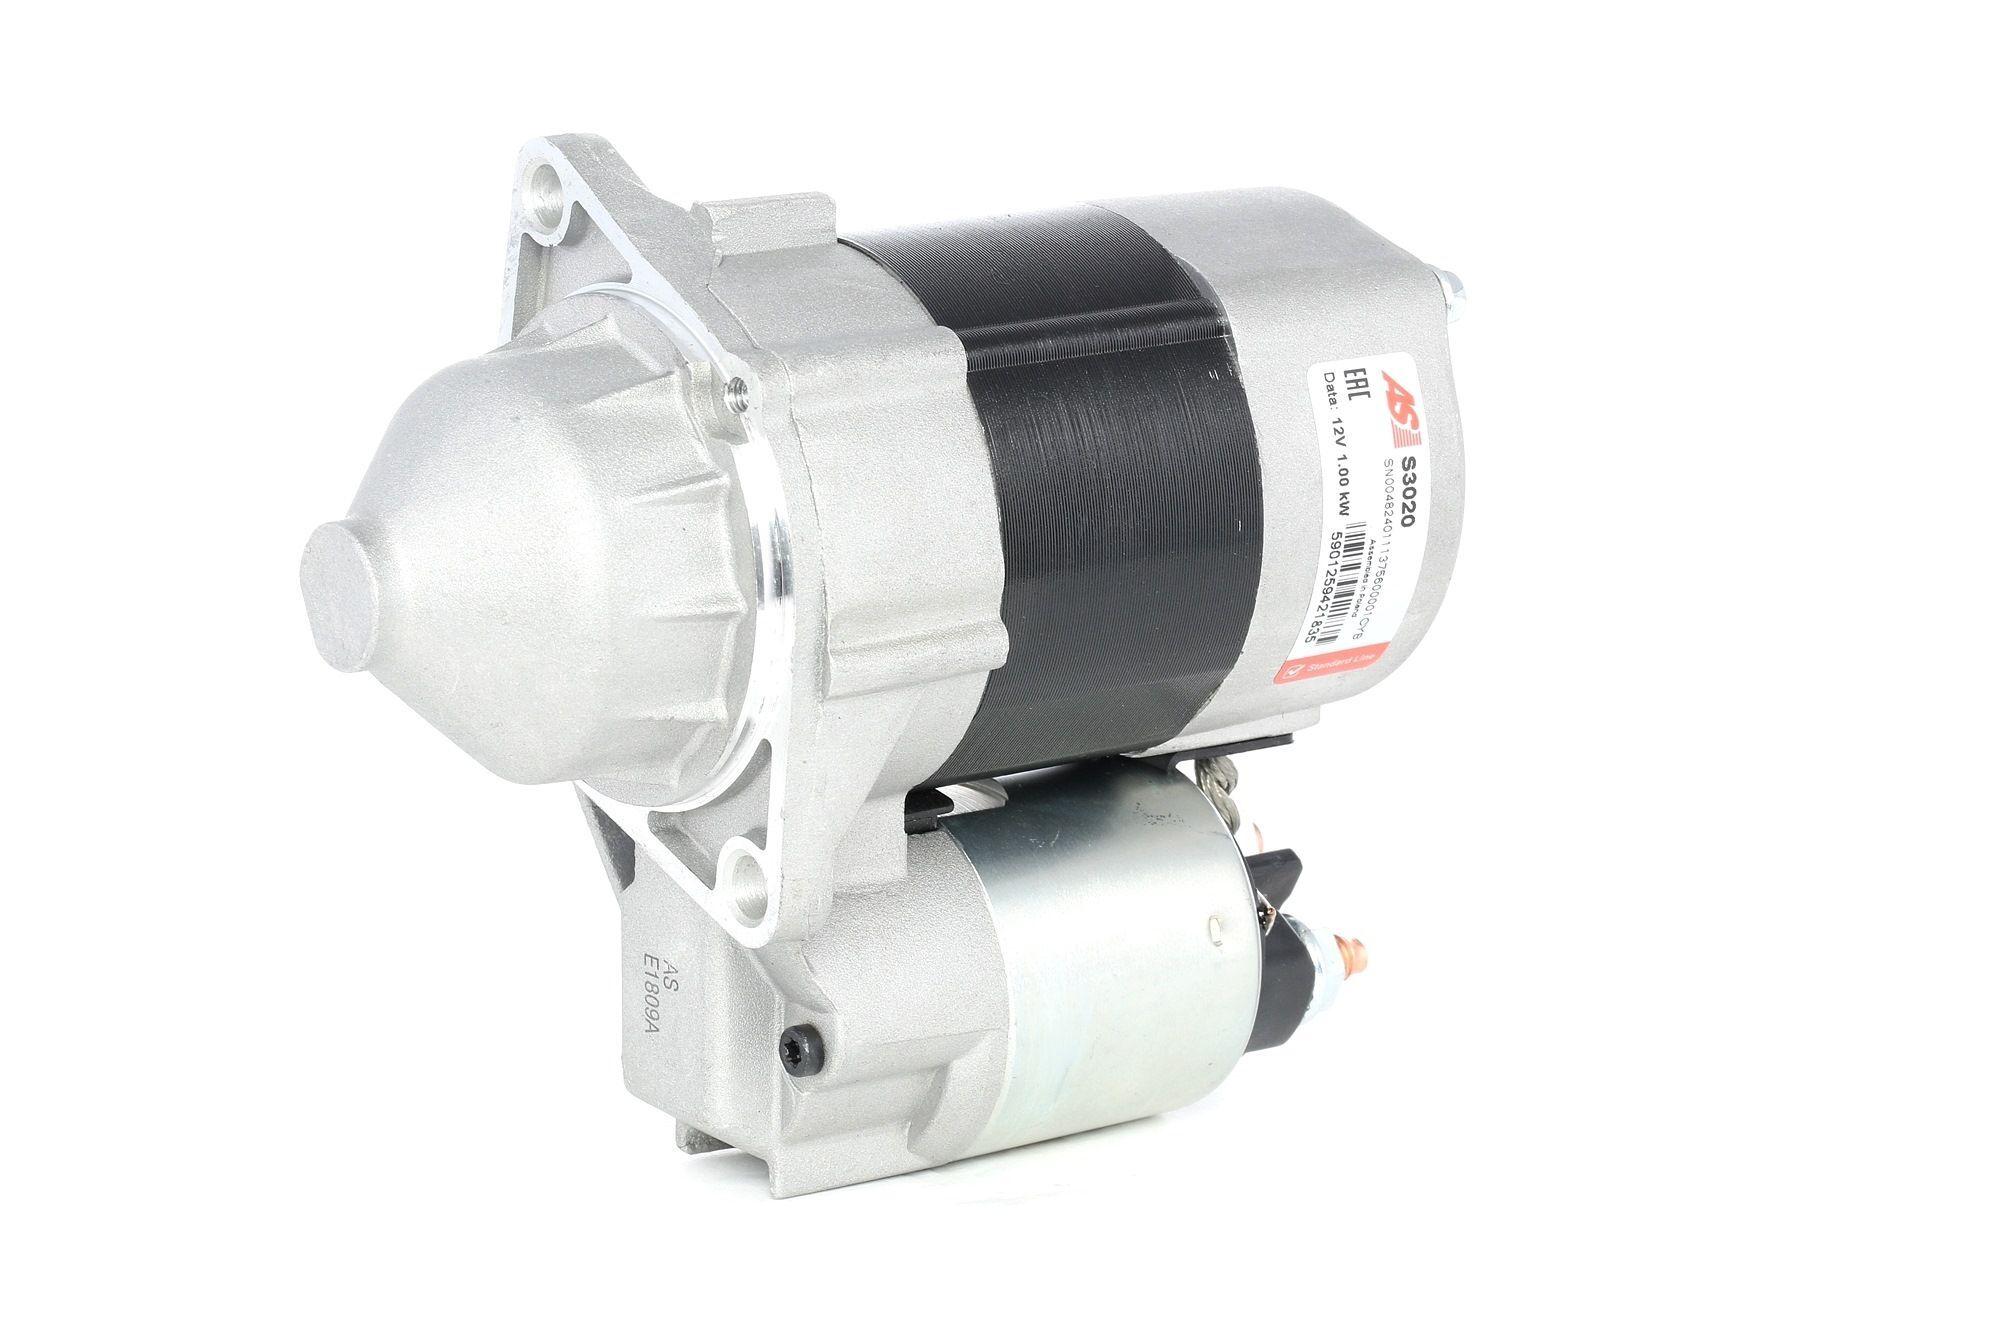 AS-PL Starttimoottori Brand new AS-PL Alternator SG12B040 S3020 Startti,Käynnistinmoottori MERCEDES-BENZ,A-CLASS W169,A-CLASS W168,B-CLASS W245